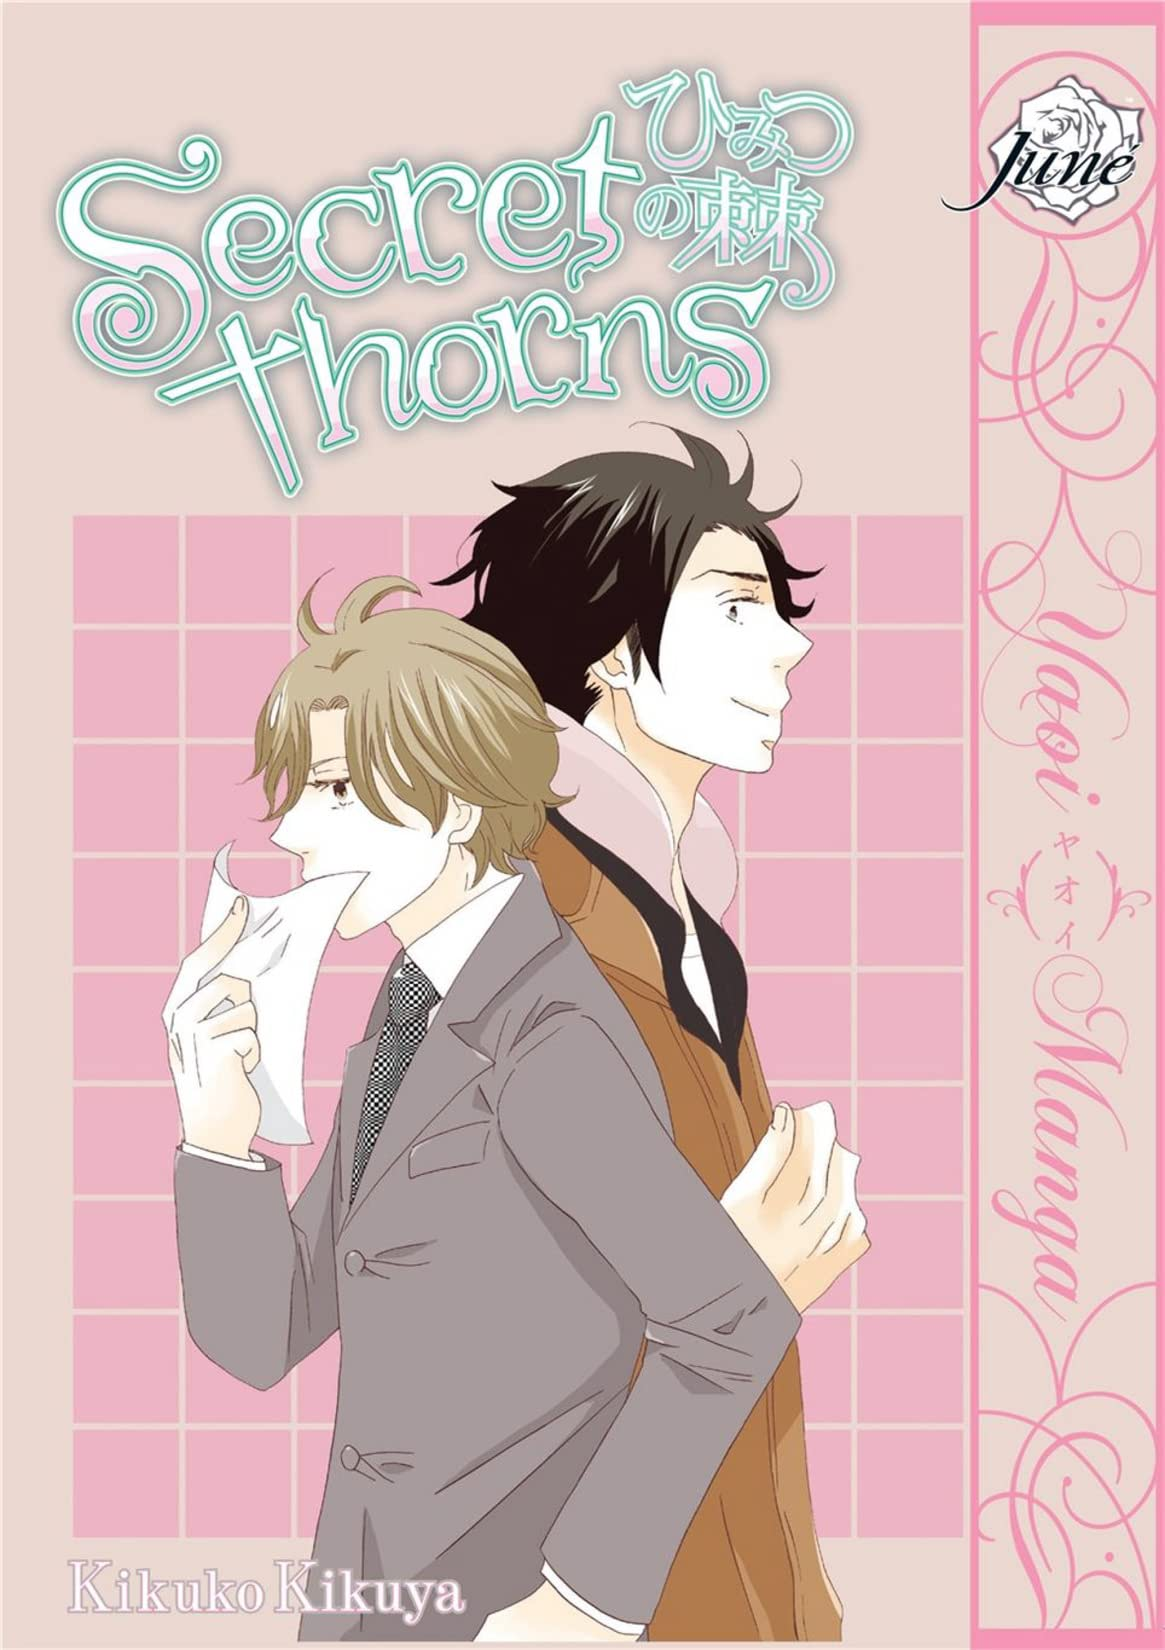 Secret Thorns